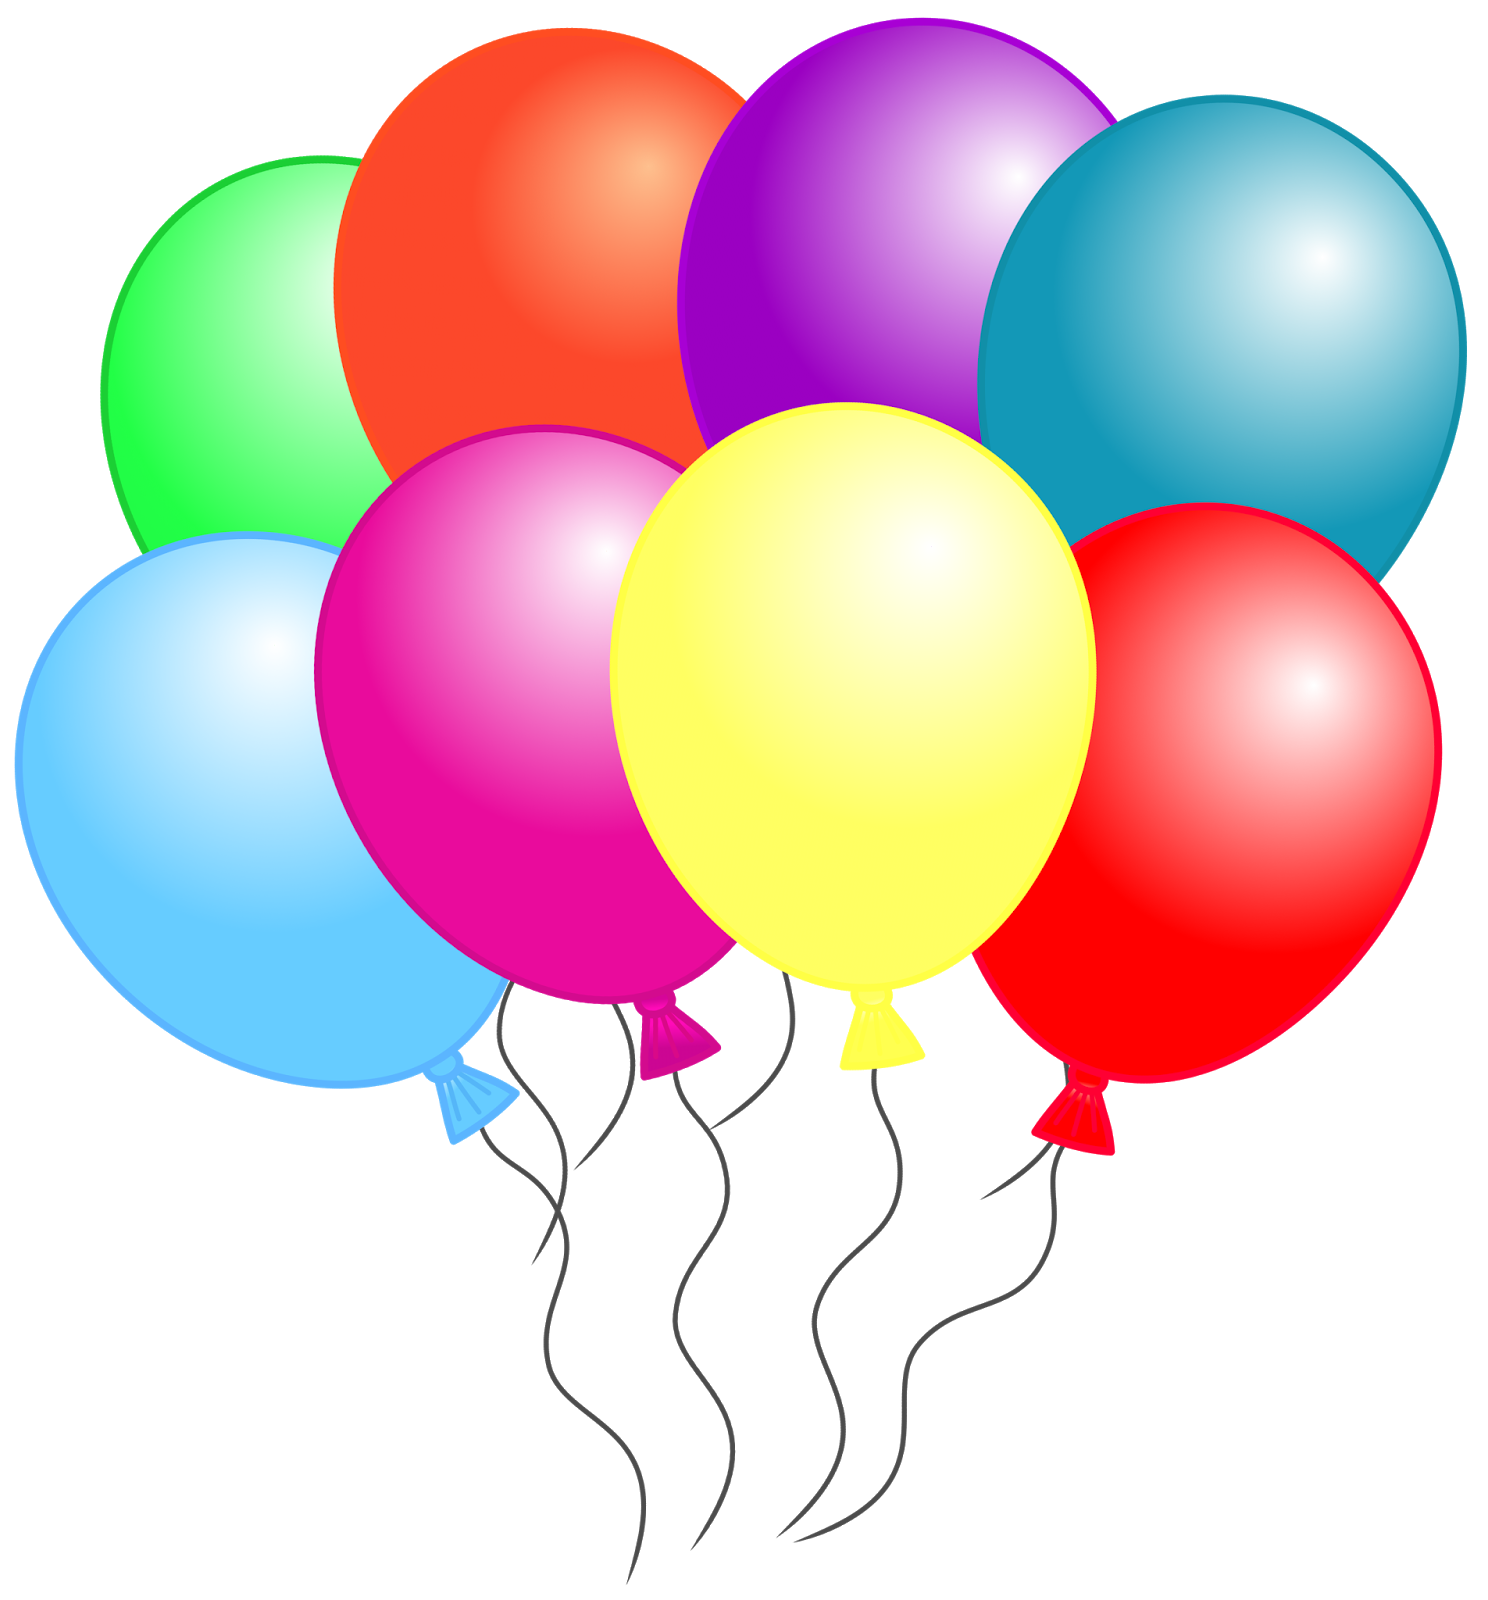 hight resolution of balloon clipart classroom clipart birthday balloons a3 cricket bulletin boards